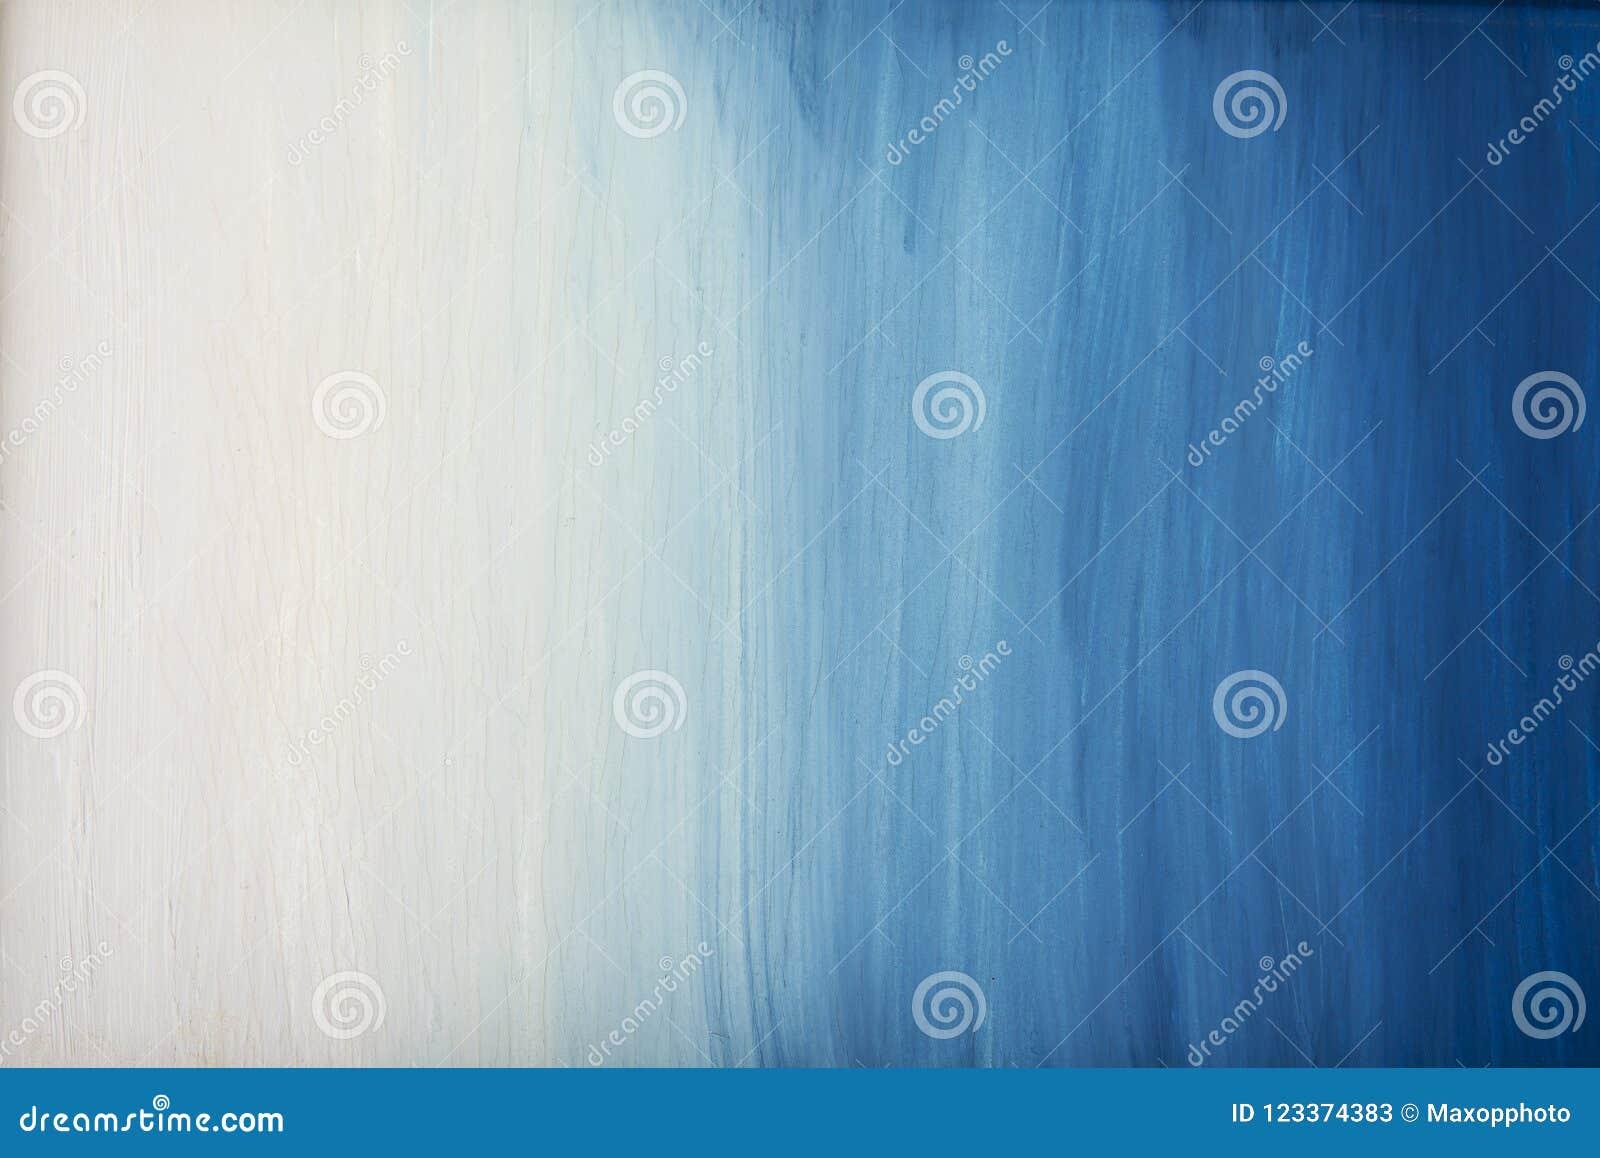 Fundo rachado da pintura da arte velha do céu azul